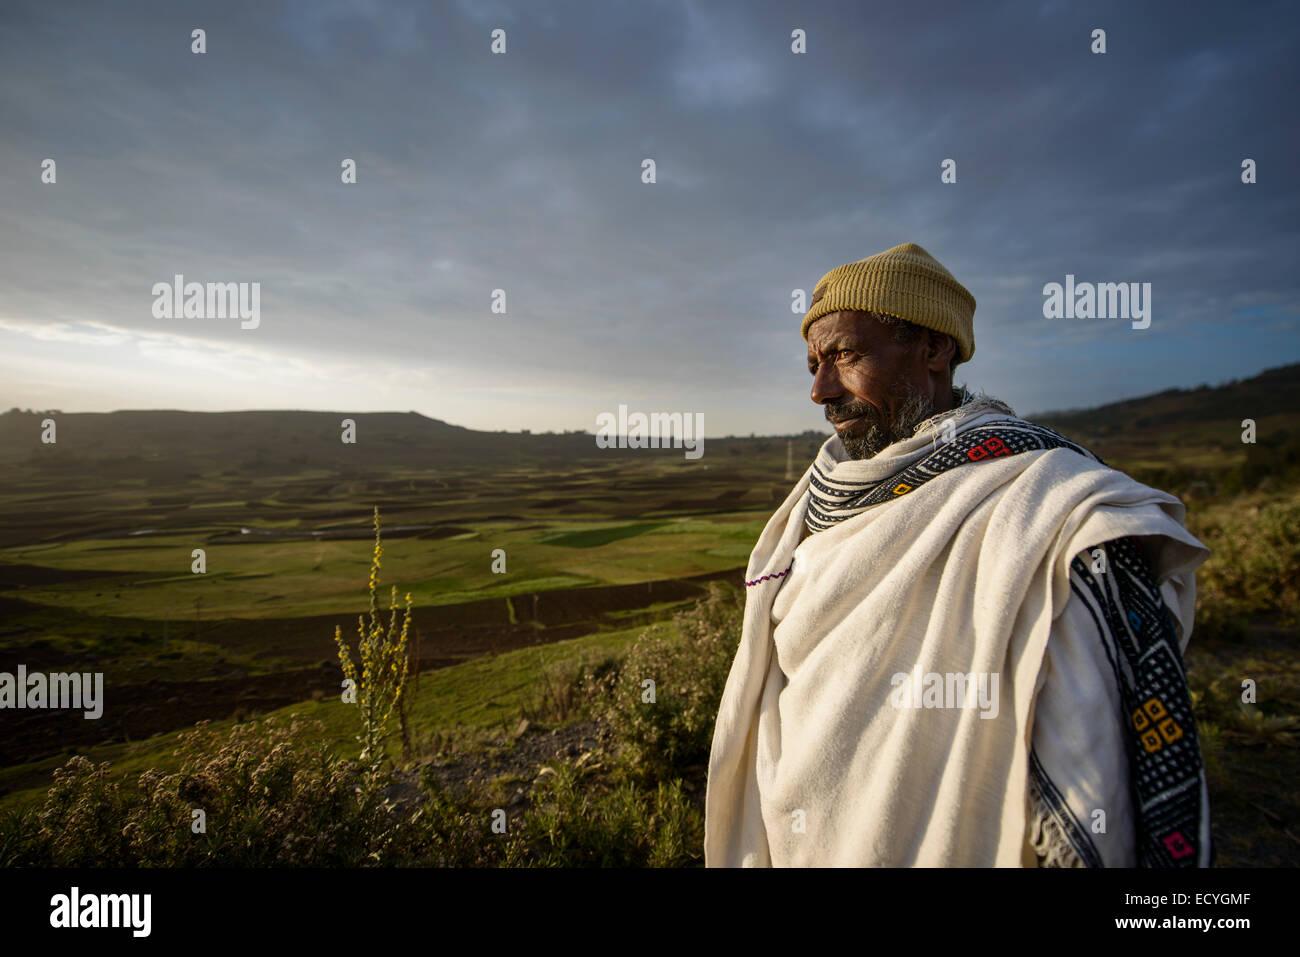 Ethiopian farmer watching his cattle, Debre Birhan, Ethiopia - Stock Image